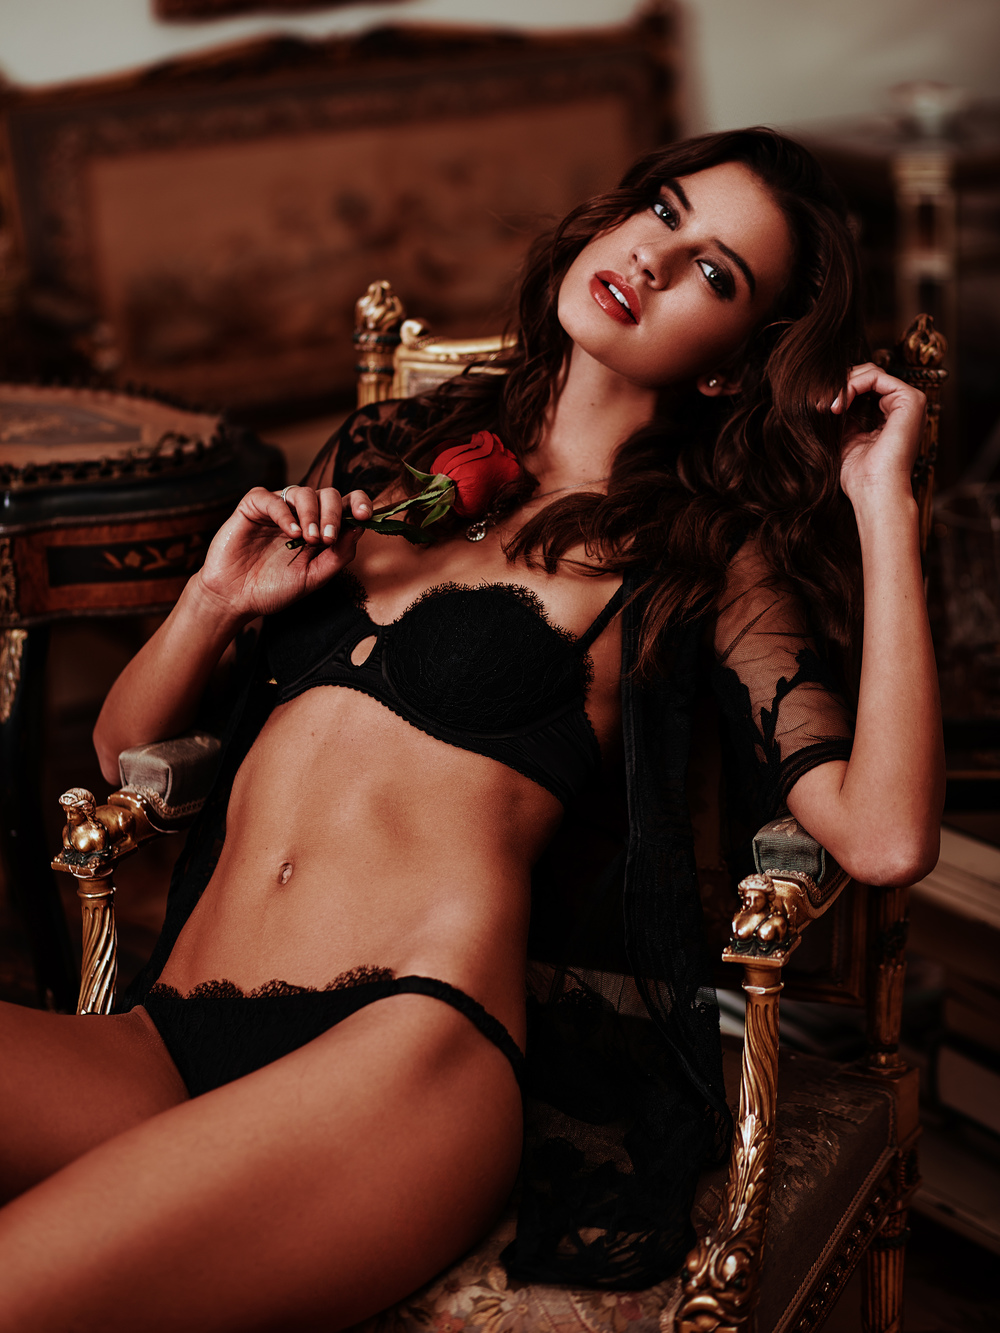 Sex Adriana Cernanova nudes (82 foto and video), Ass, Cleavage, Twitter, butt 2019